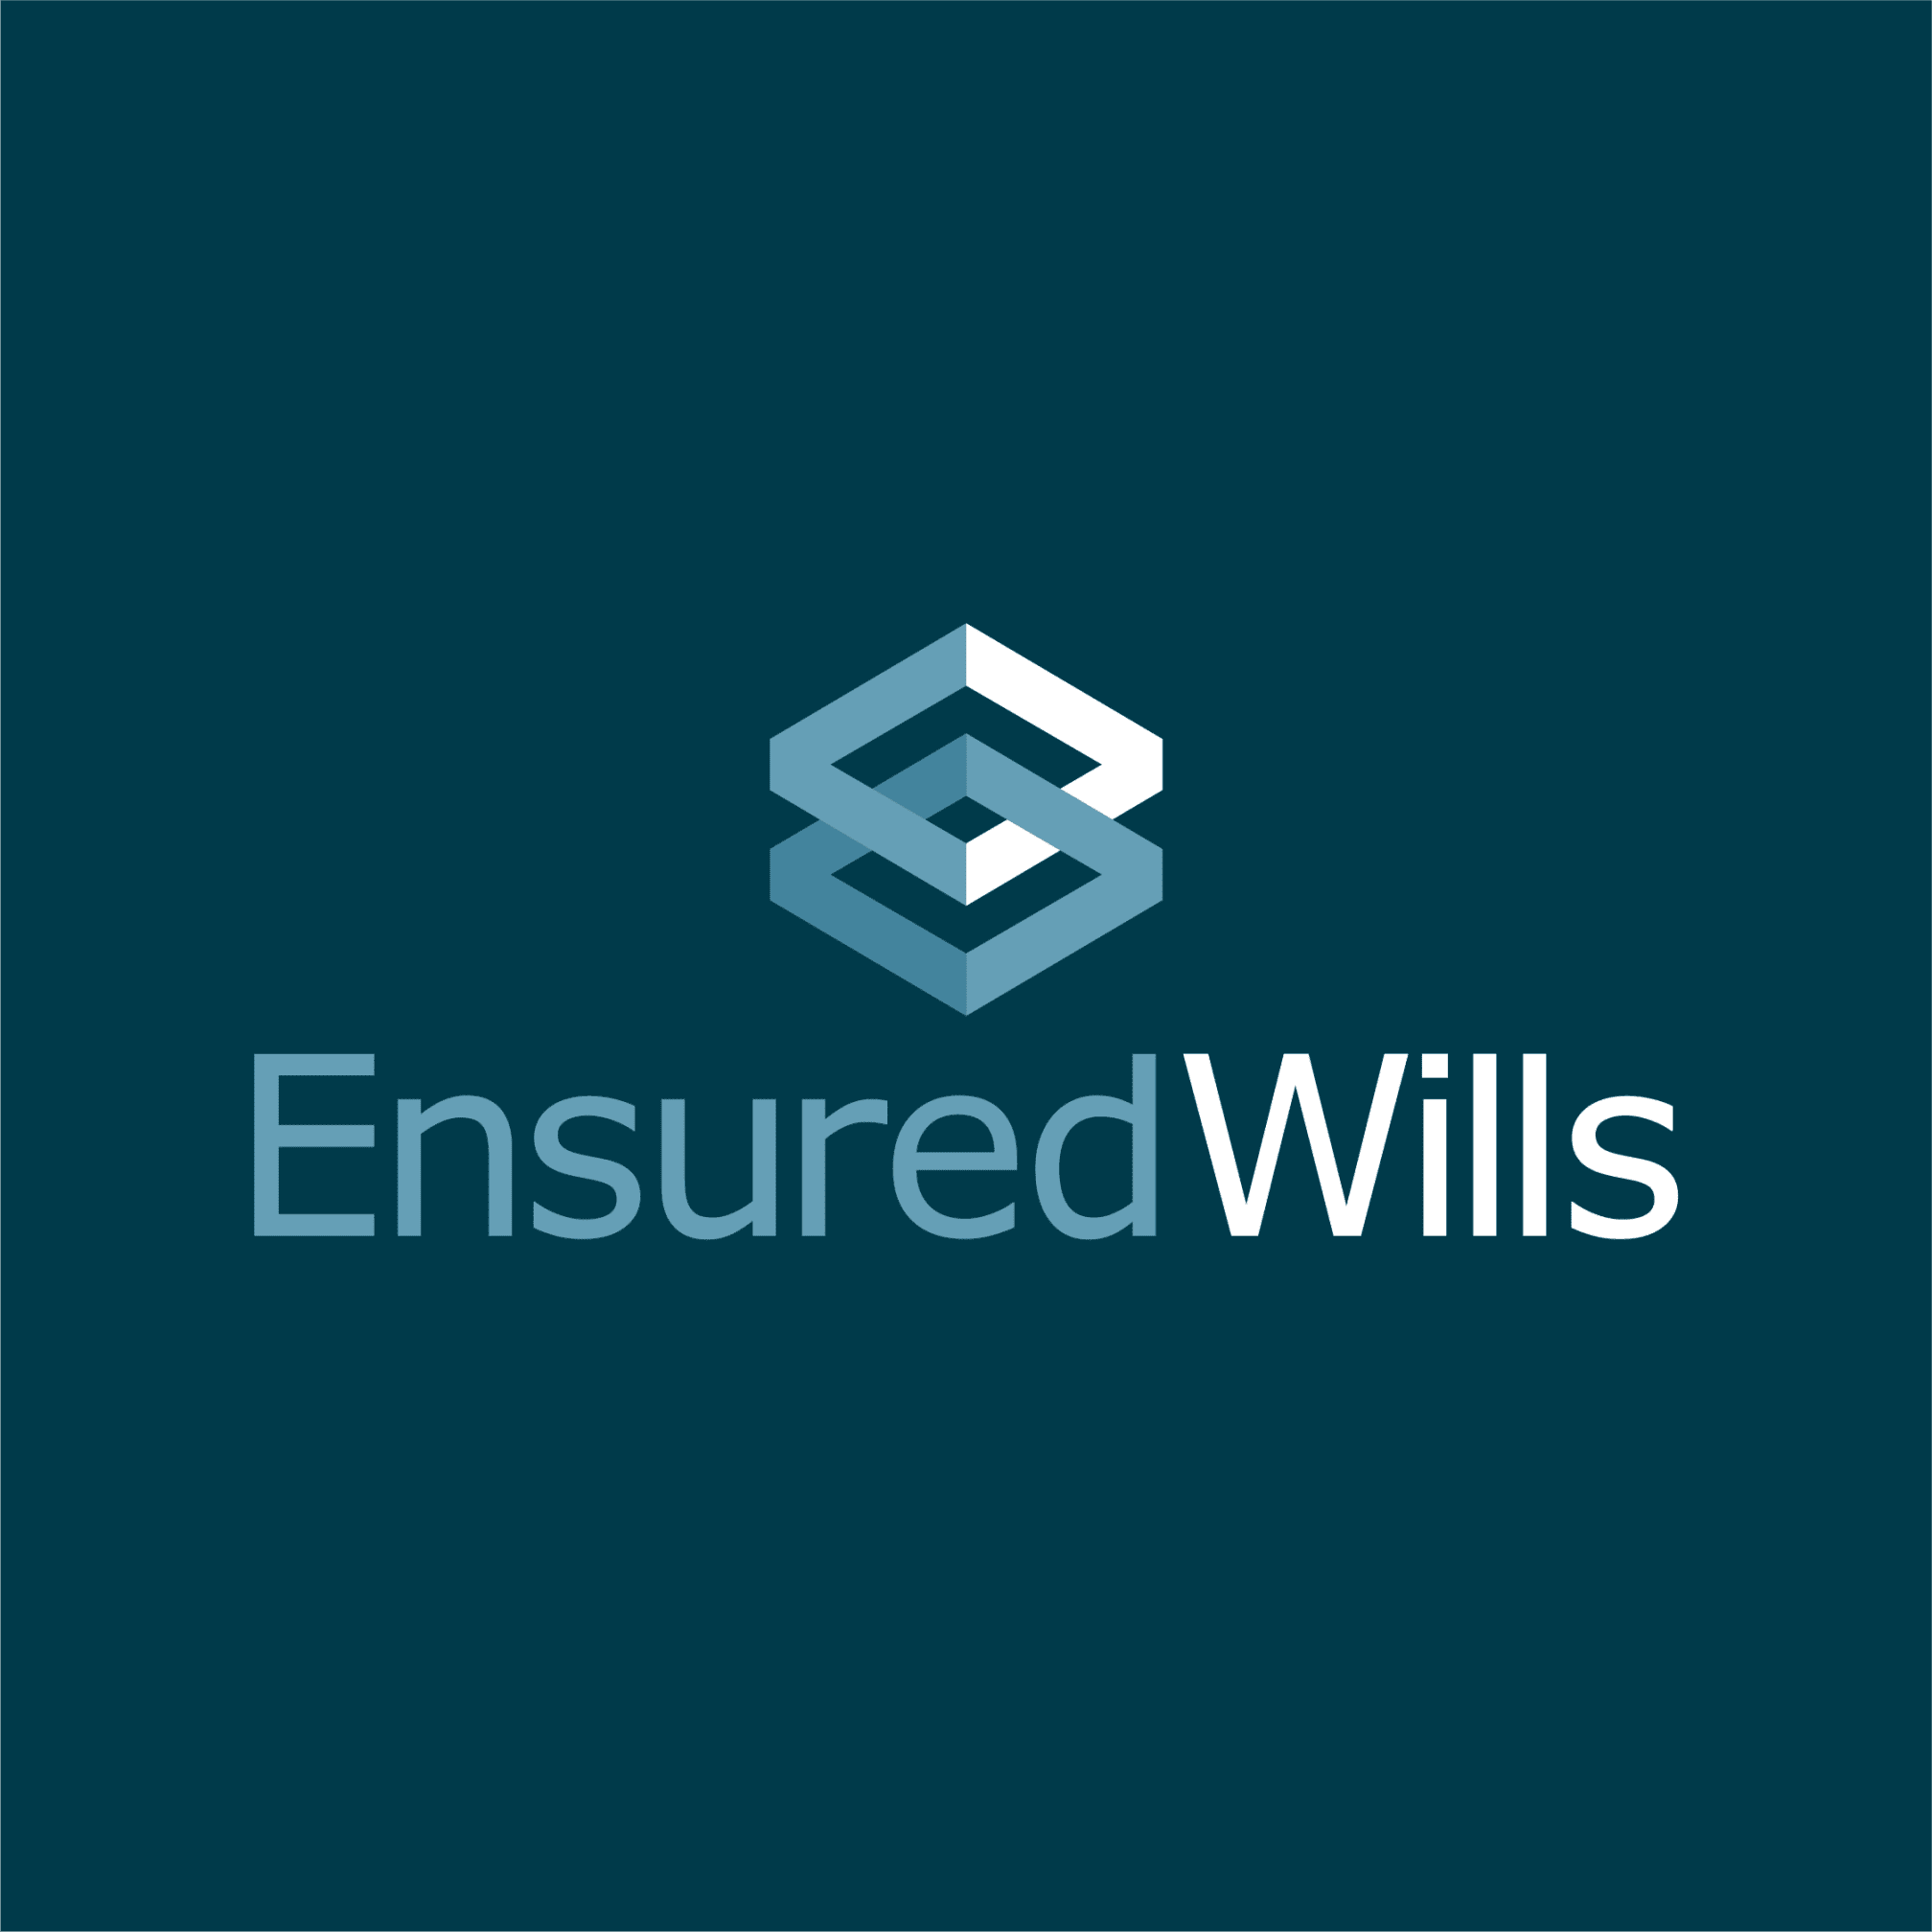 Ensured Wills Ltd - Redditch, Worcestershire B97 5FL - 07972 023604 | ShowMeLocal.com